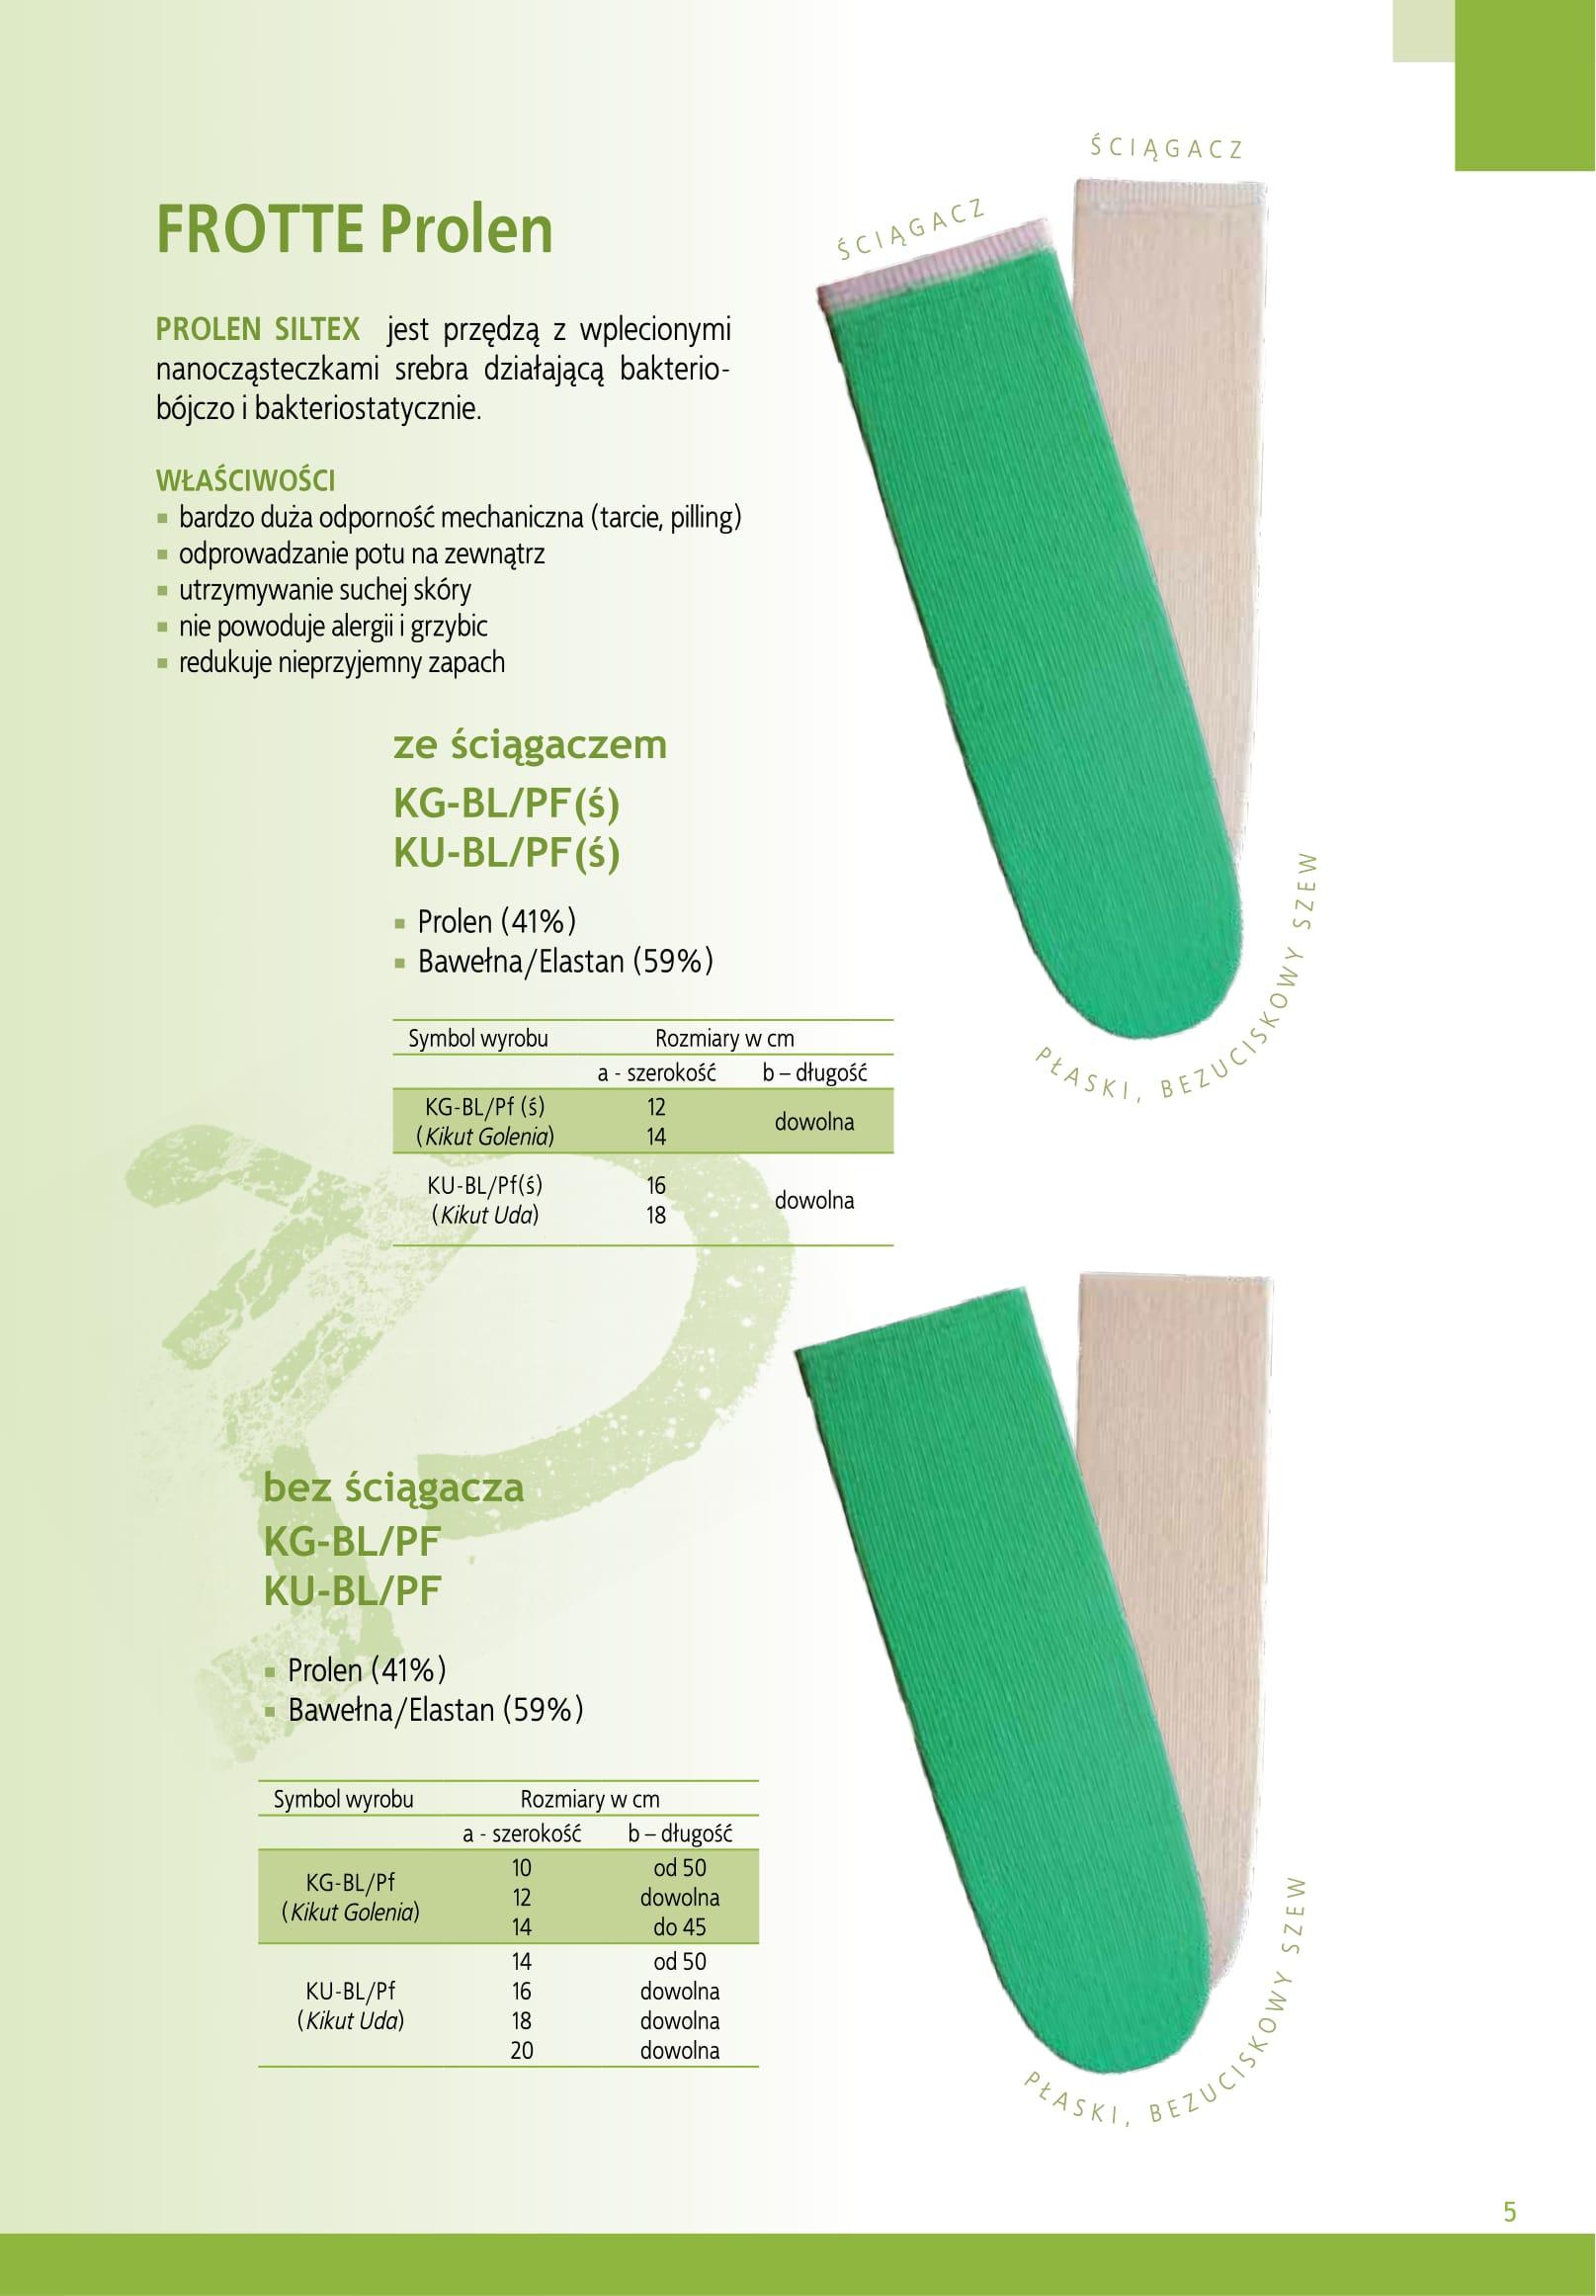 katalog_ortopedia-07